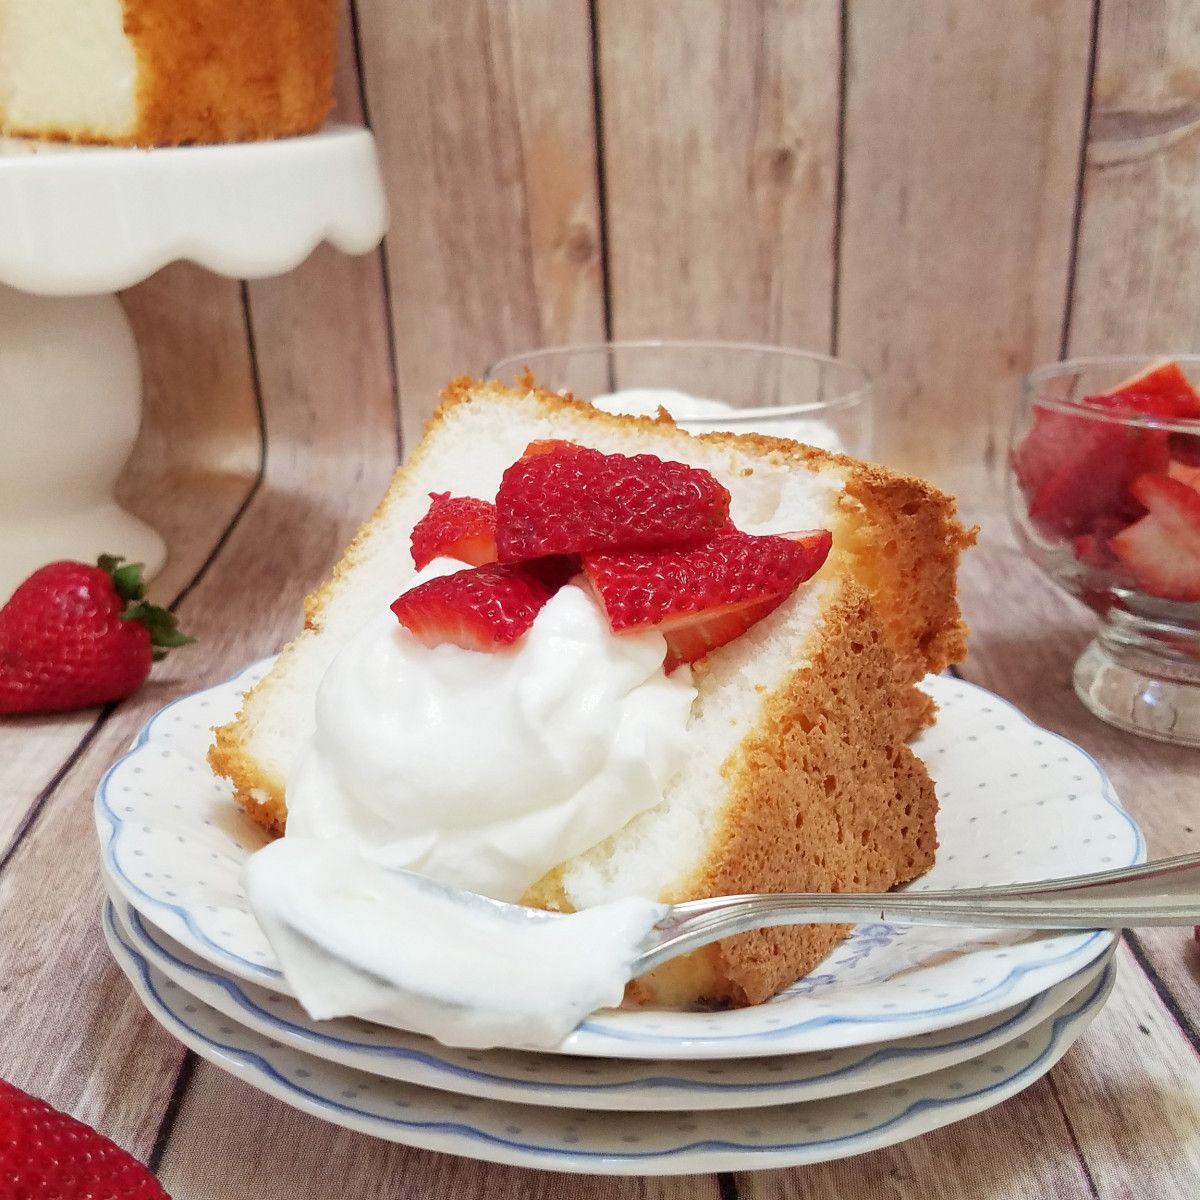 Ina Garten's Angel Food Cake Gluten free angel food cake